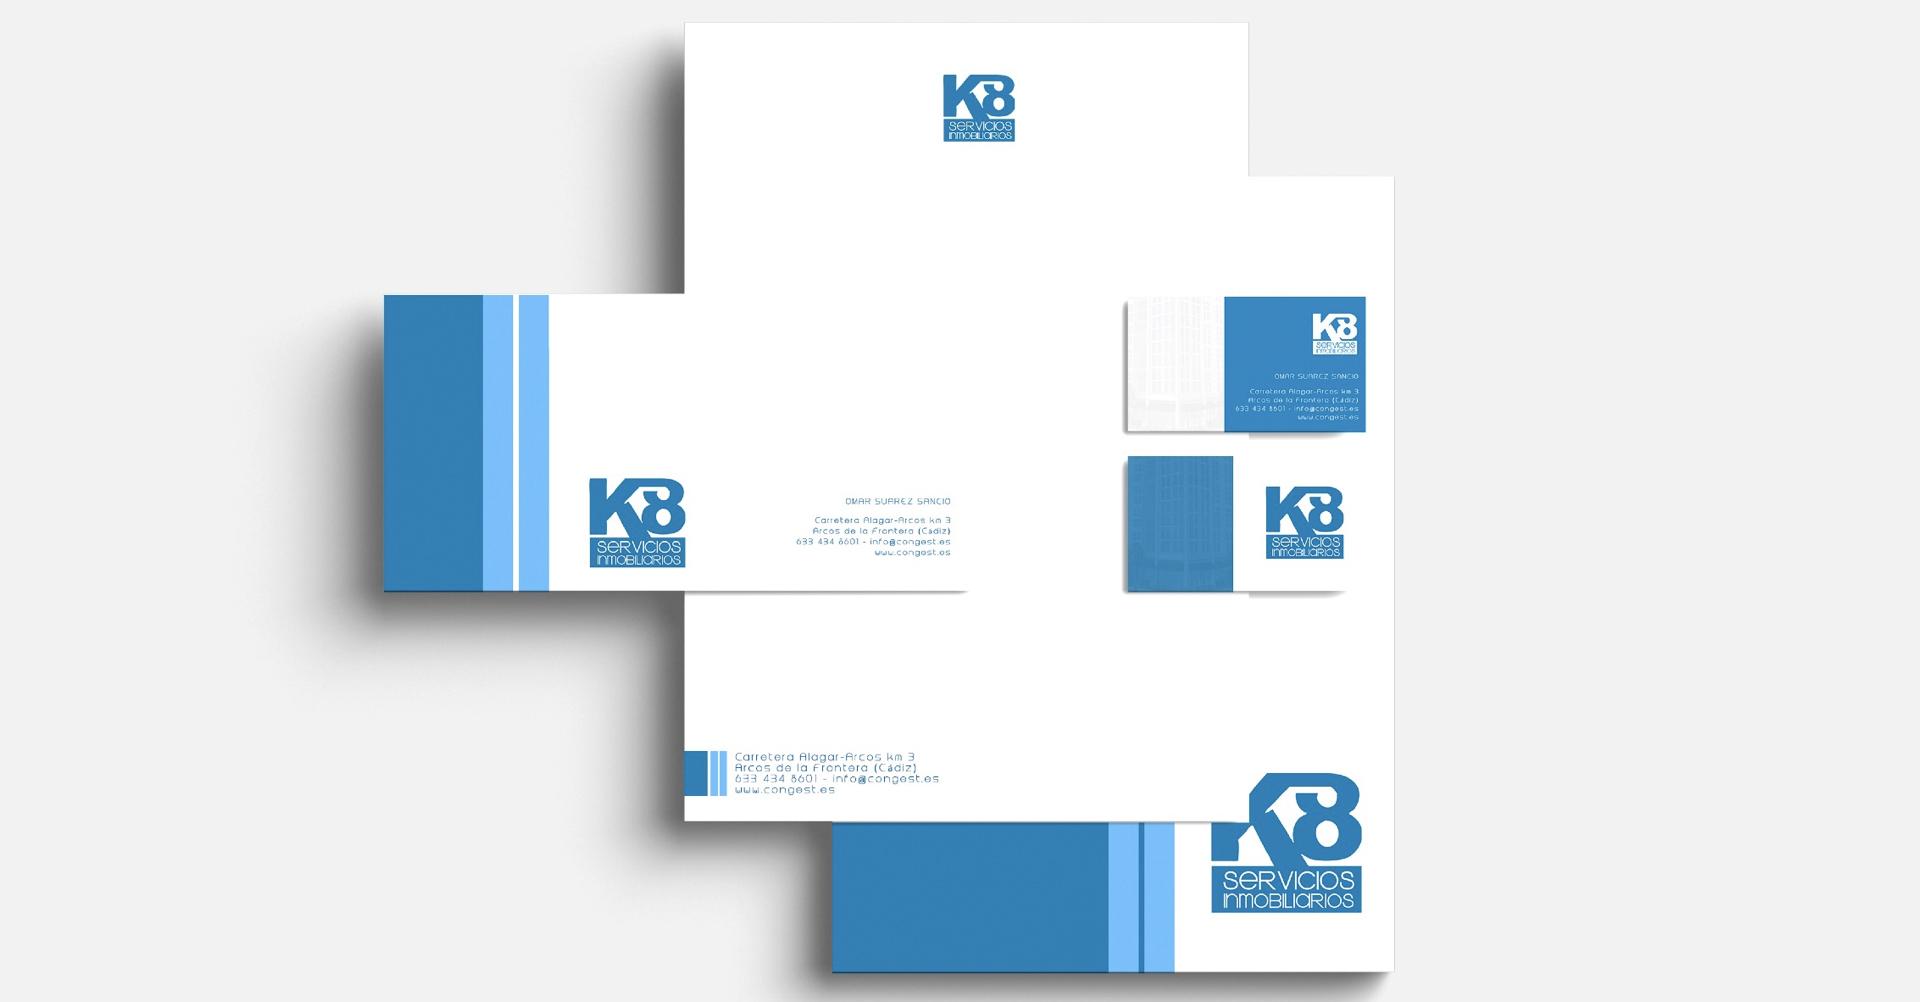 K8 Servicios inmobiliarios | Corporativa